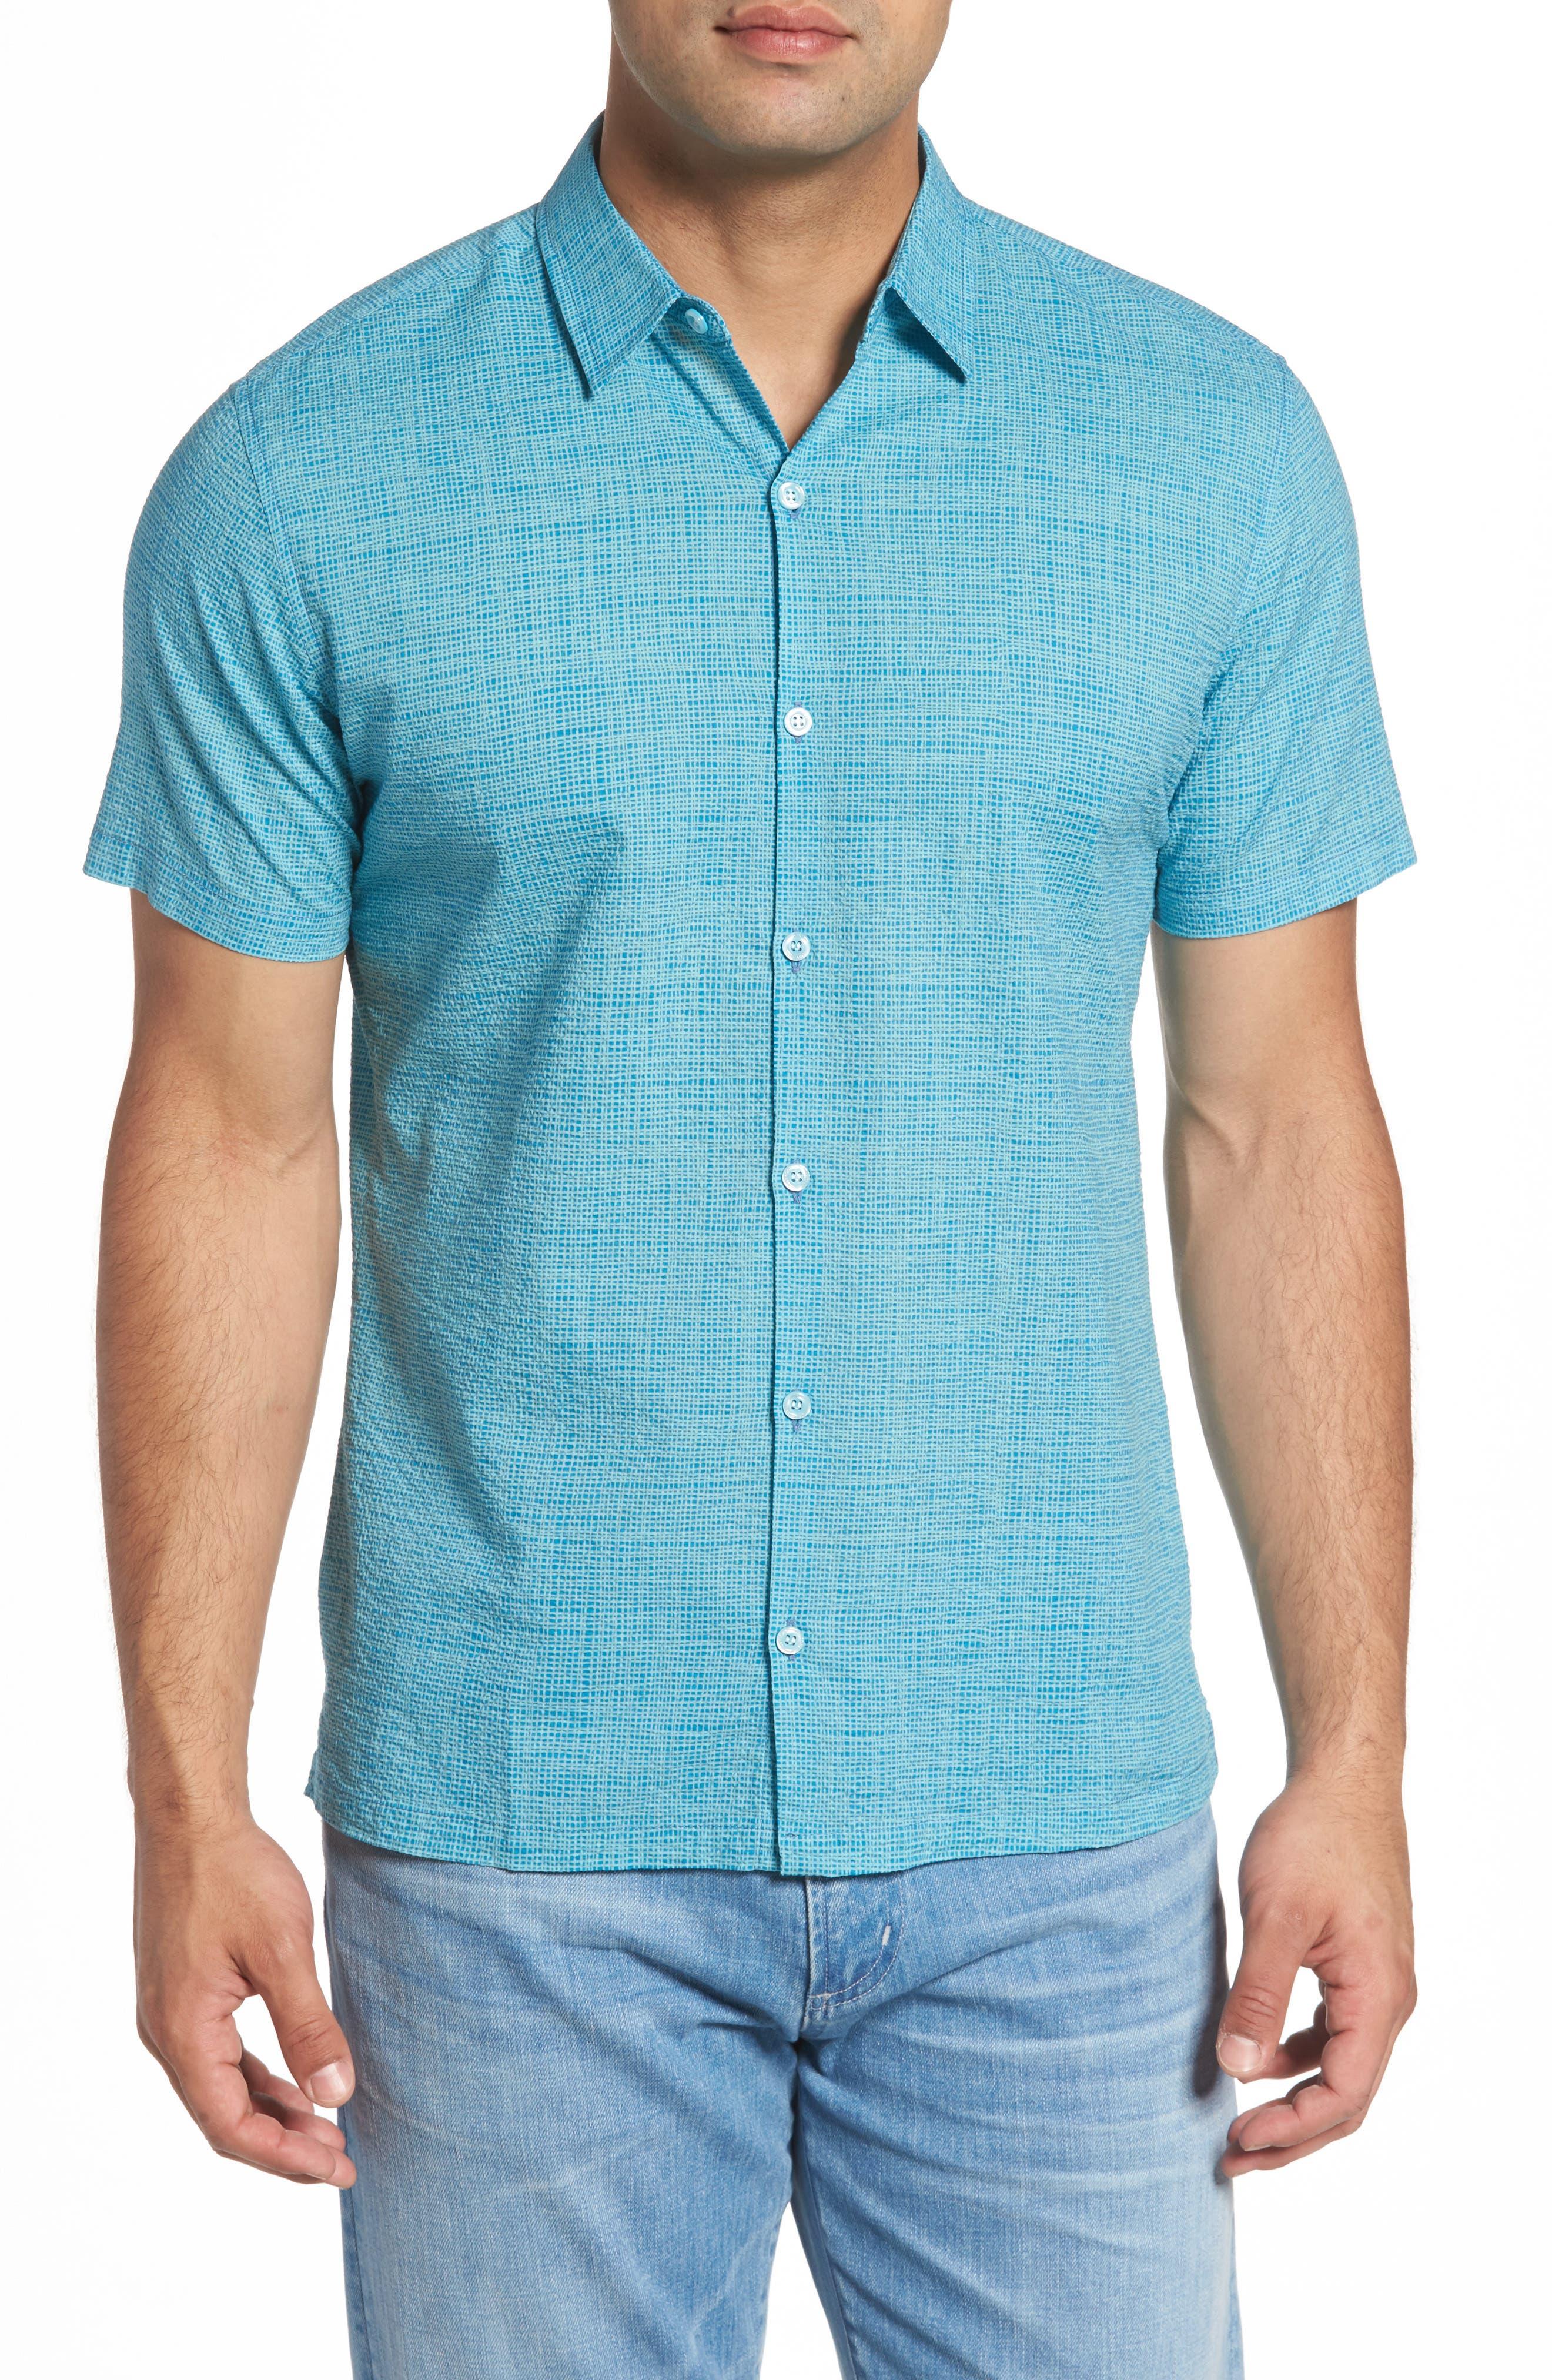 Net Worth Slim Fit Camp Shirt,                             Main thumbnail 1, color,                             400